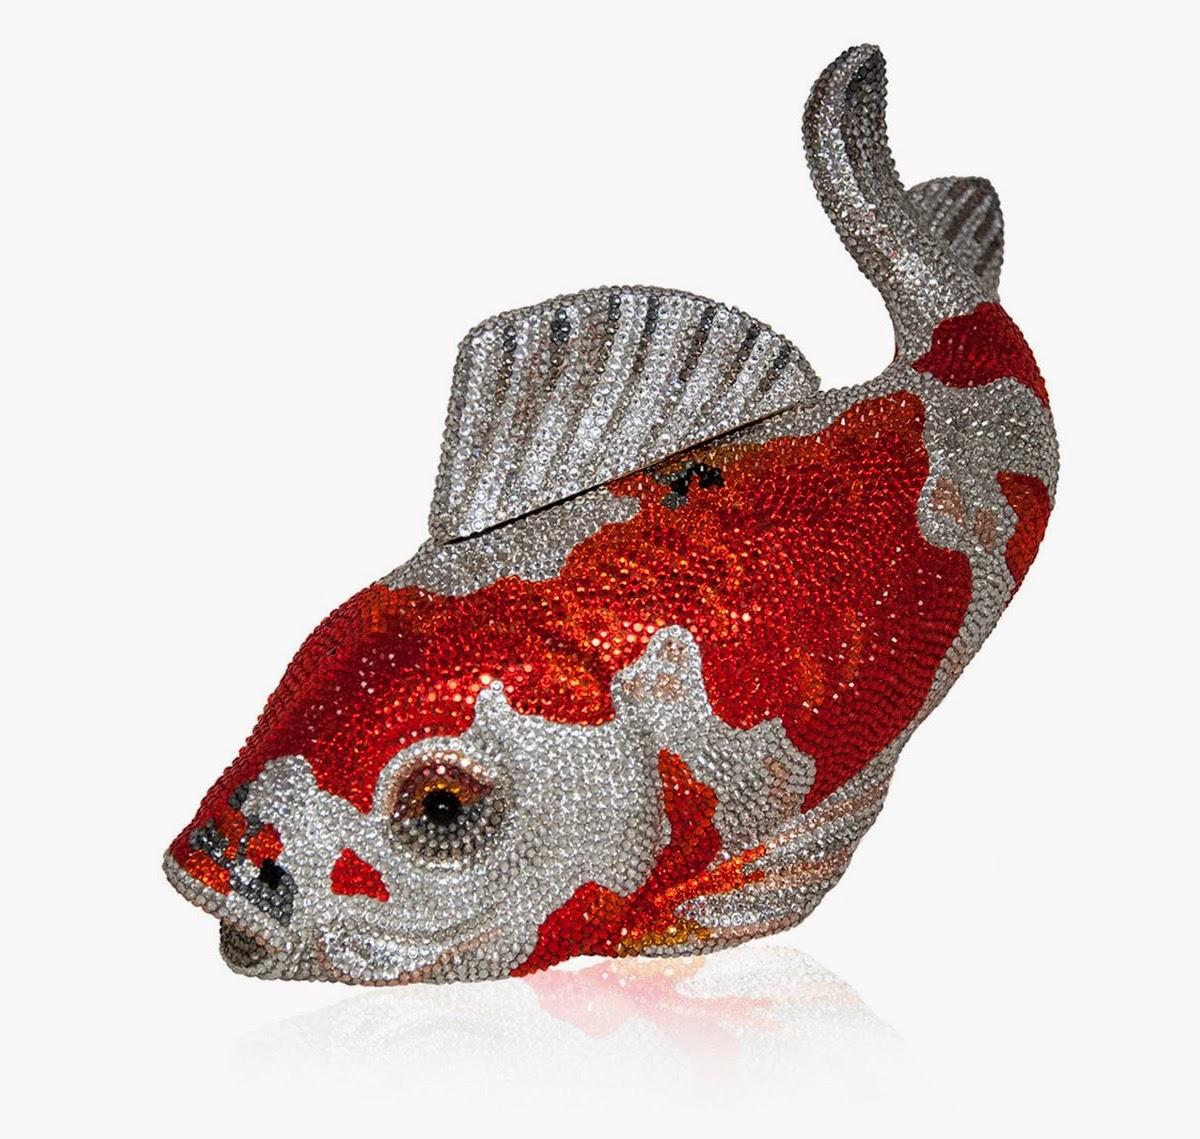 Judith Leiber Couture Koi Fish Crystal Minaudiere, Orange/Silver